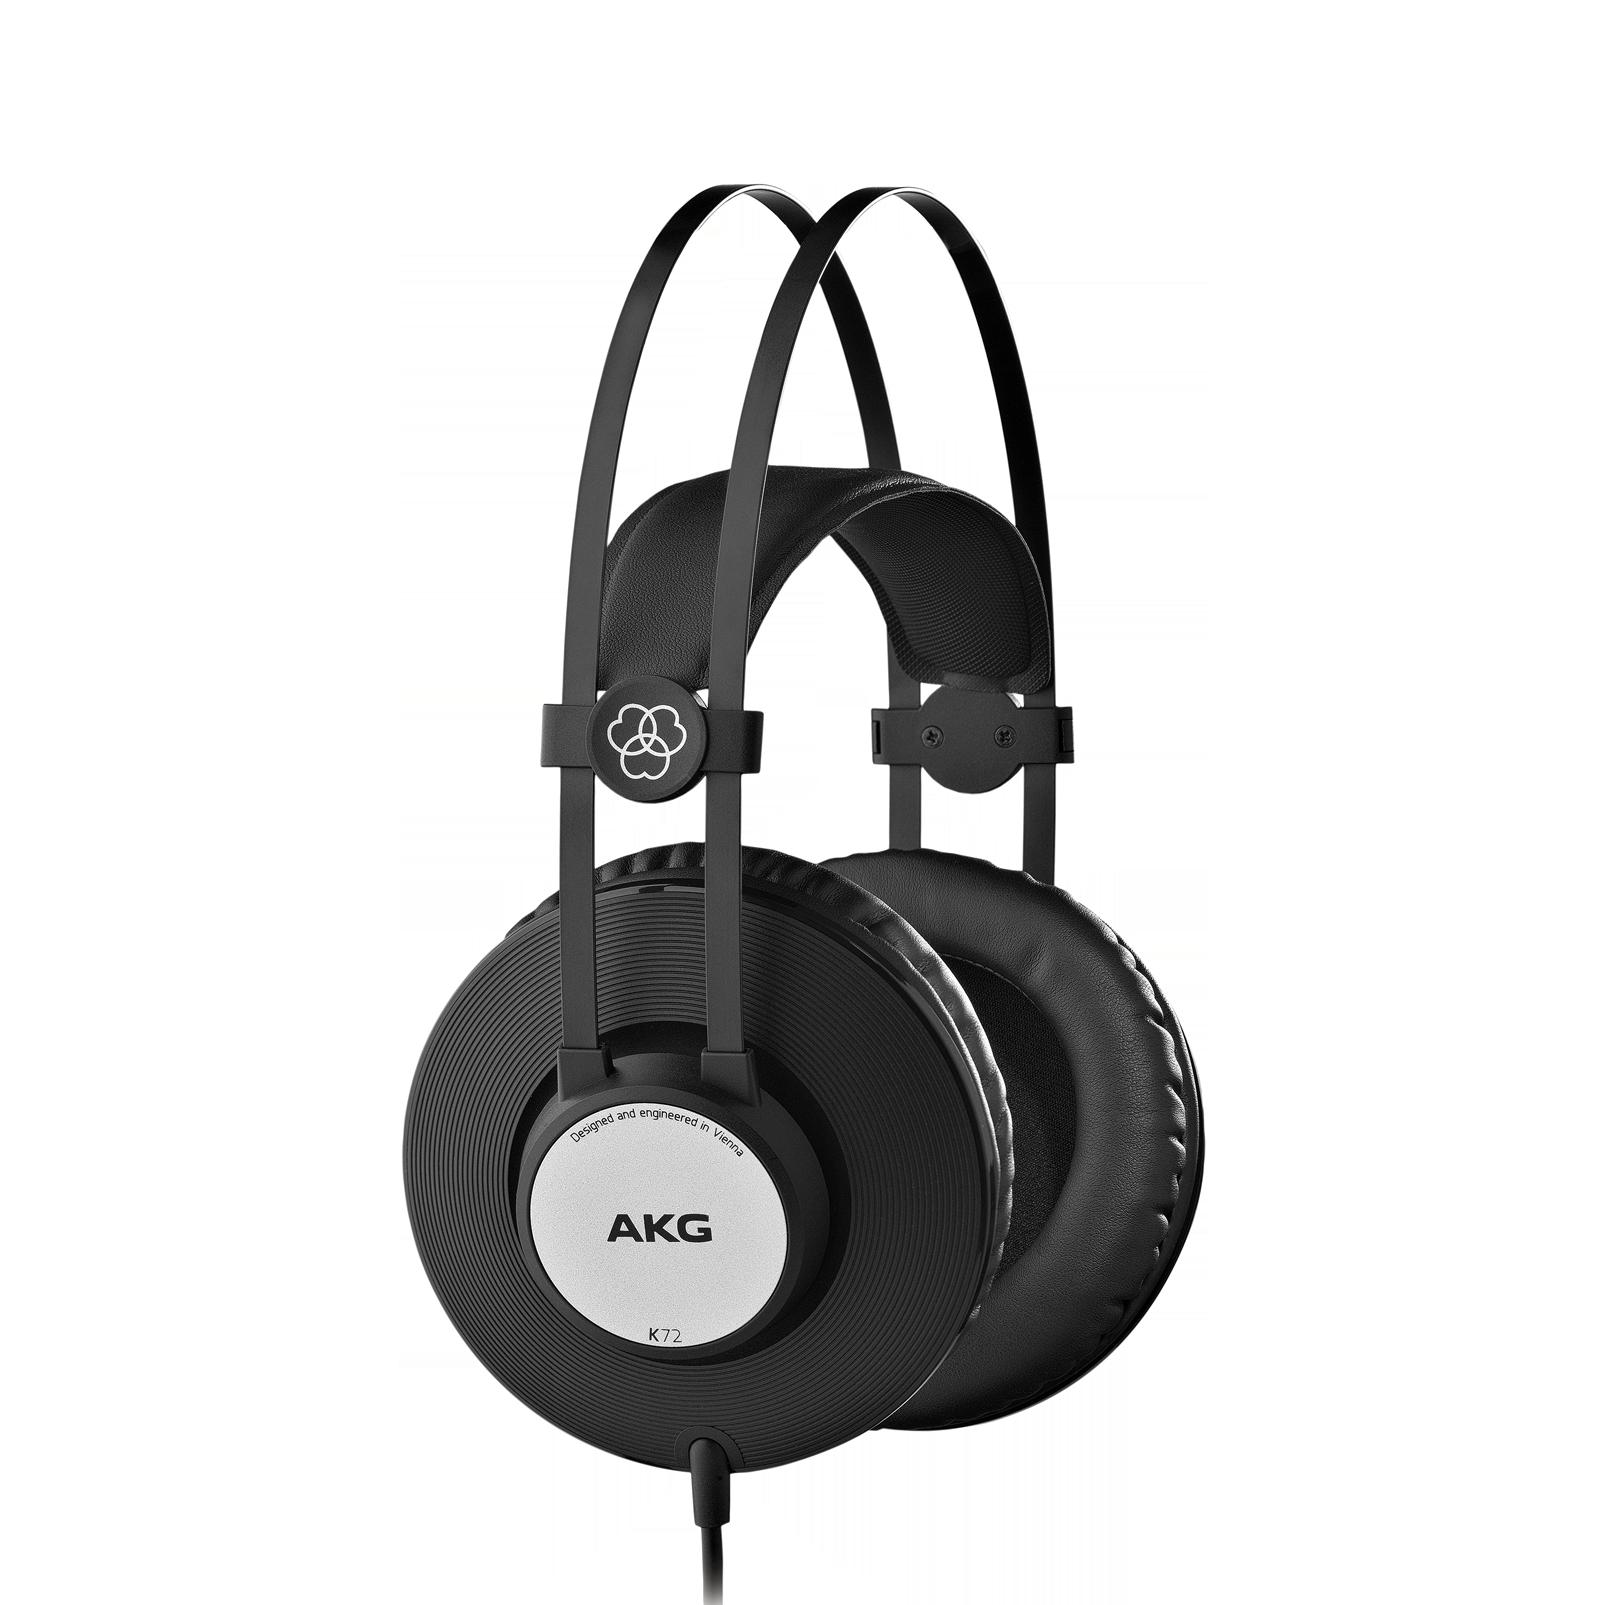 AKG K72 Closed Back Professional Studio Headphones